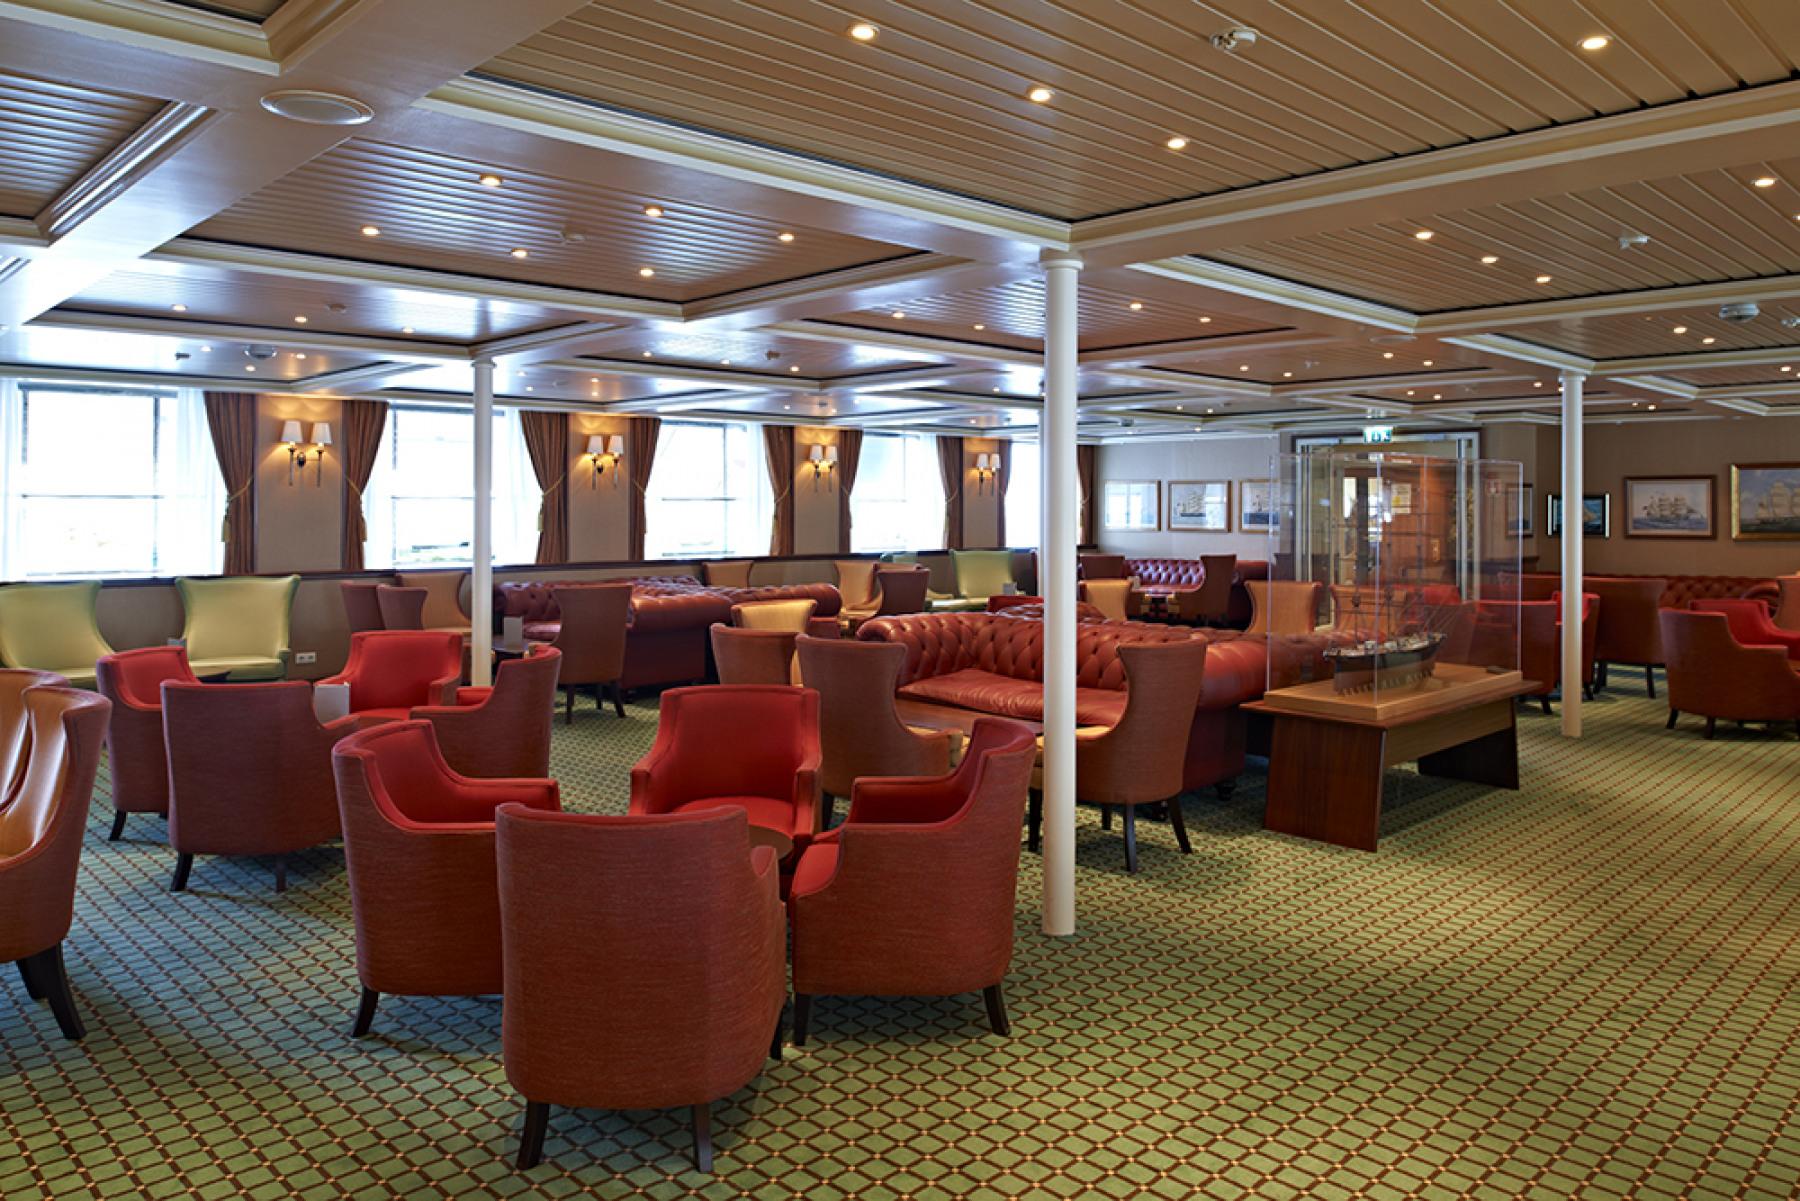 fred olsen cruise lines balmoral lounge 4 2014.jpg